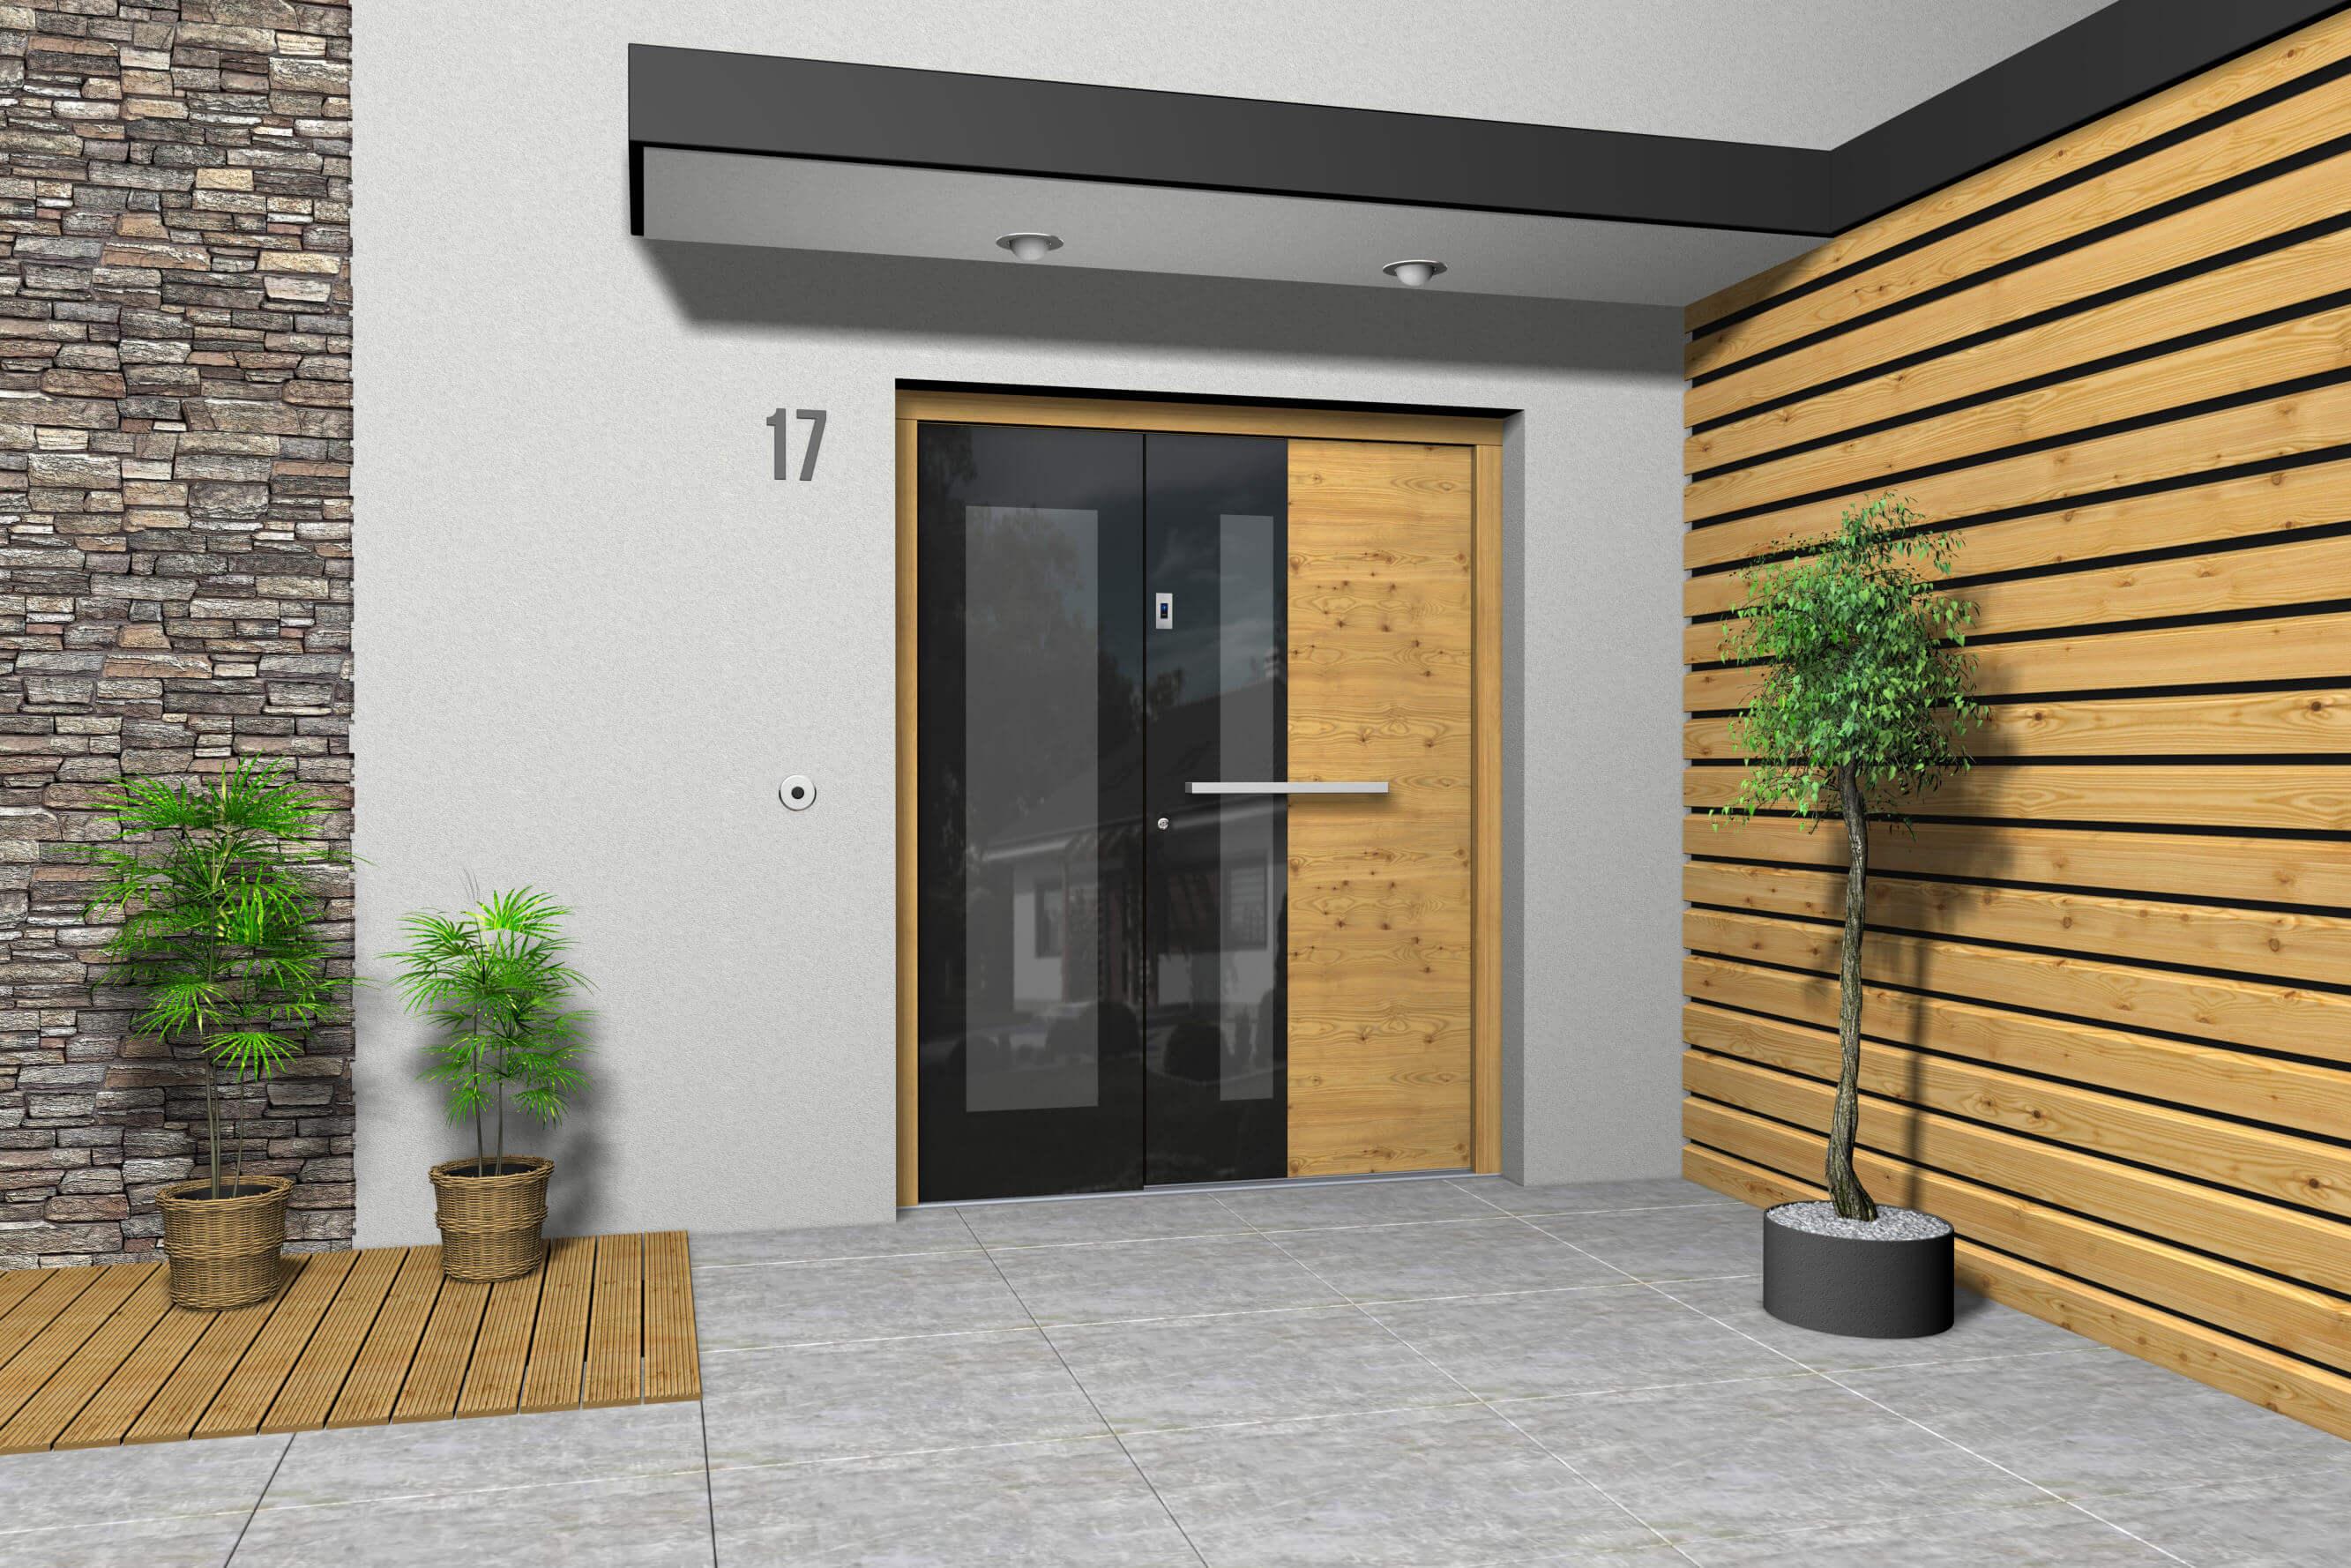 haust ren holz exclusiv astig ks hausbau24. Black Bedroom Furniture Sets. Home Design Ideas